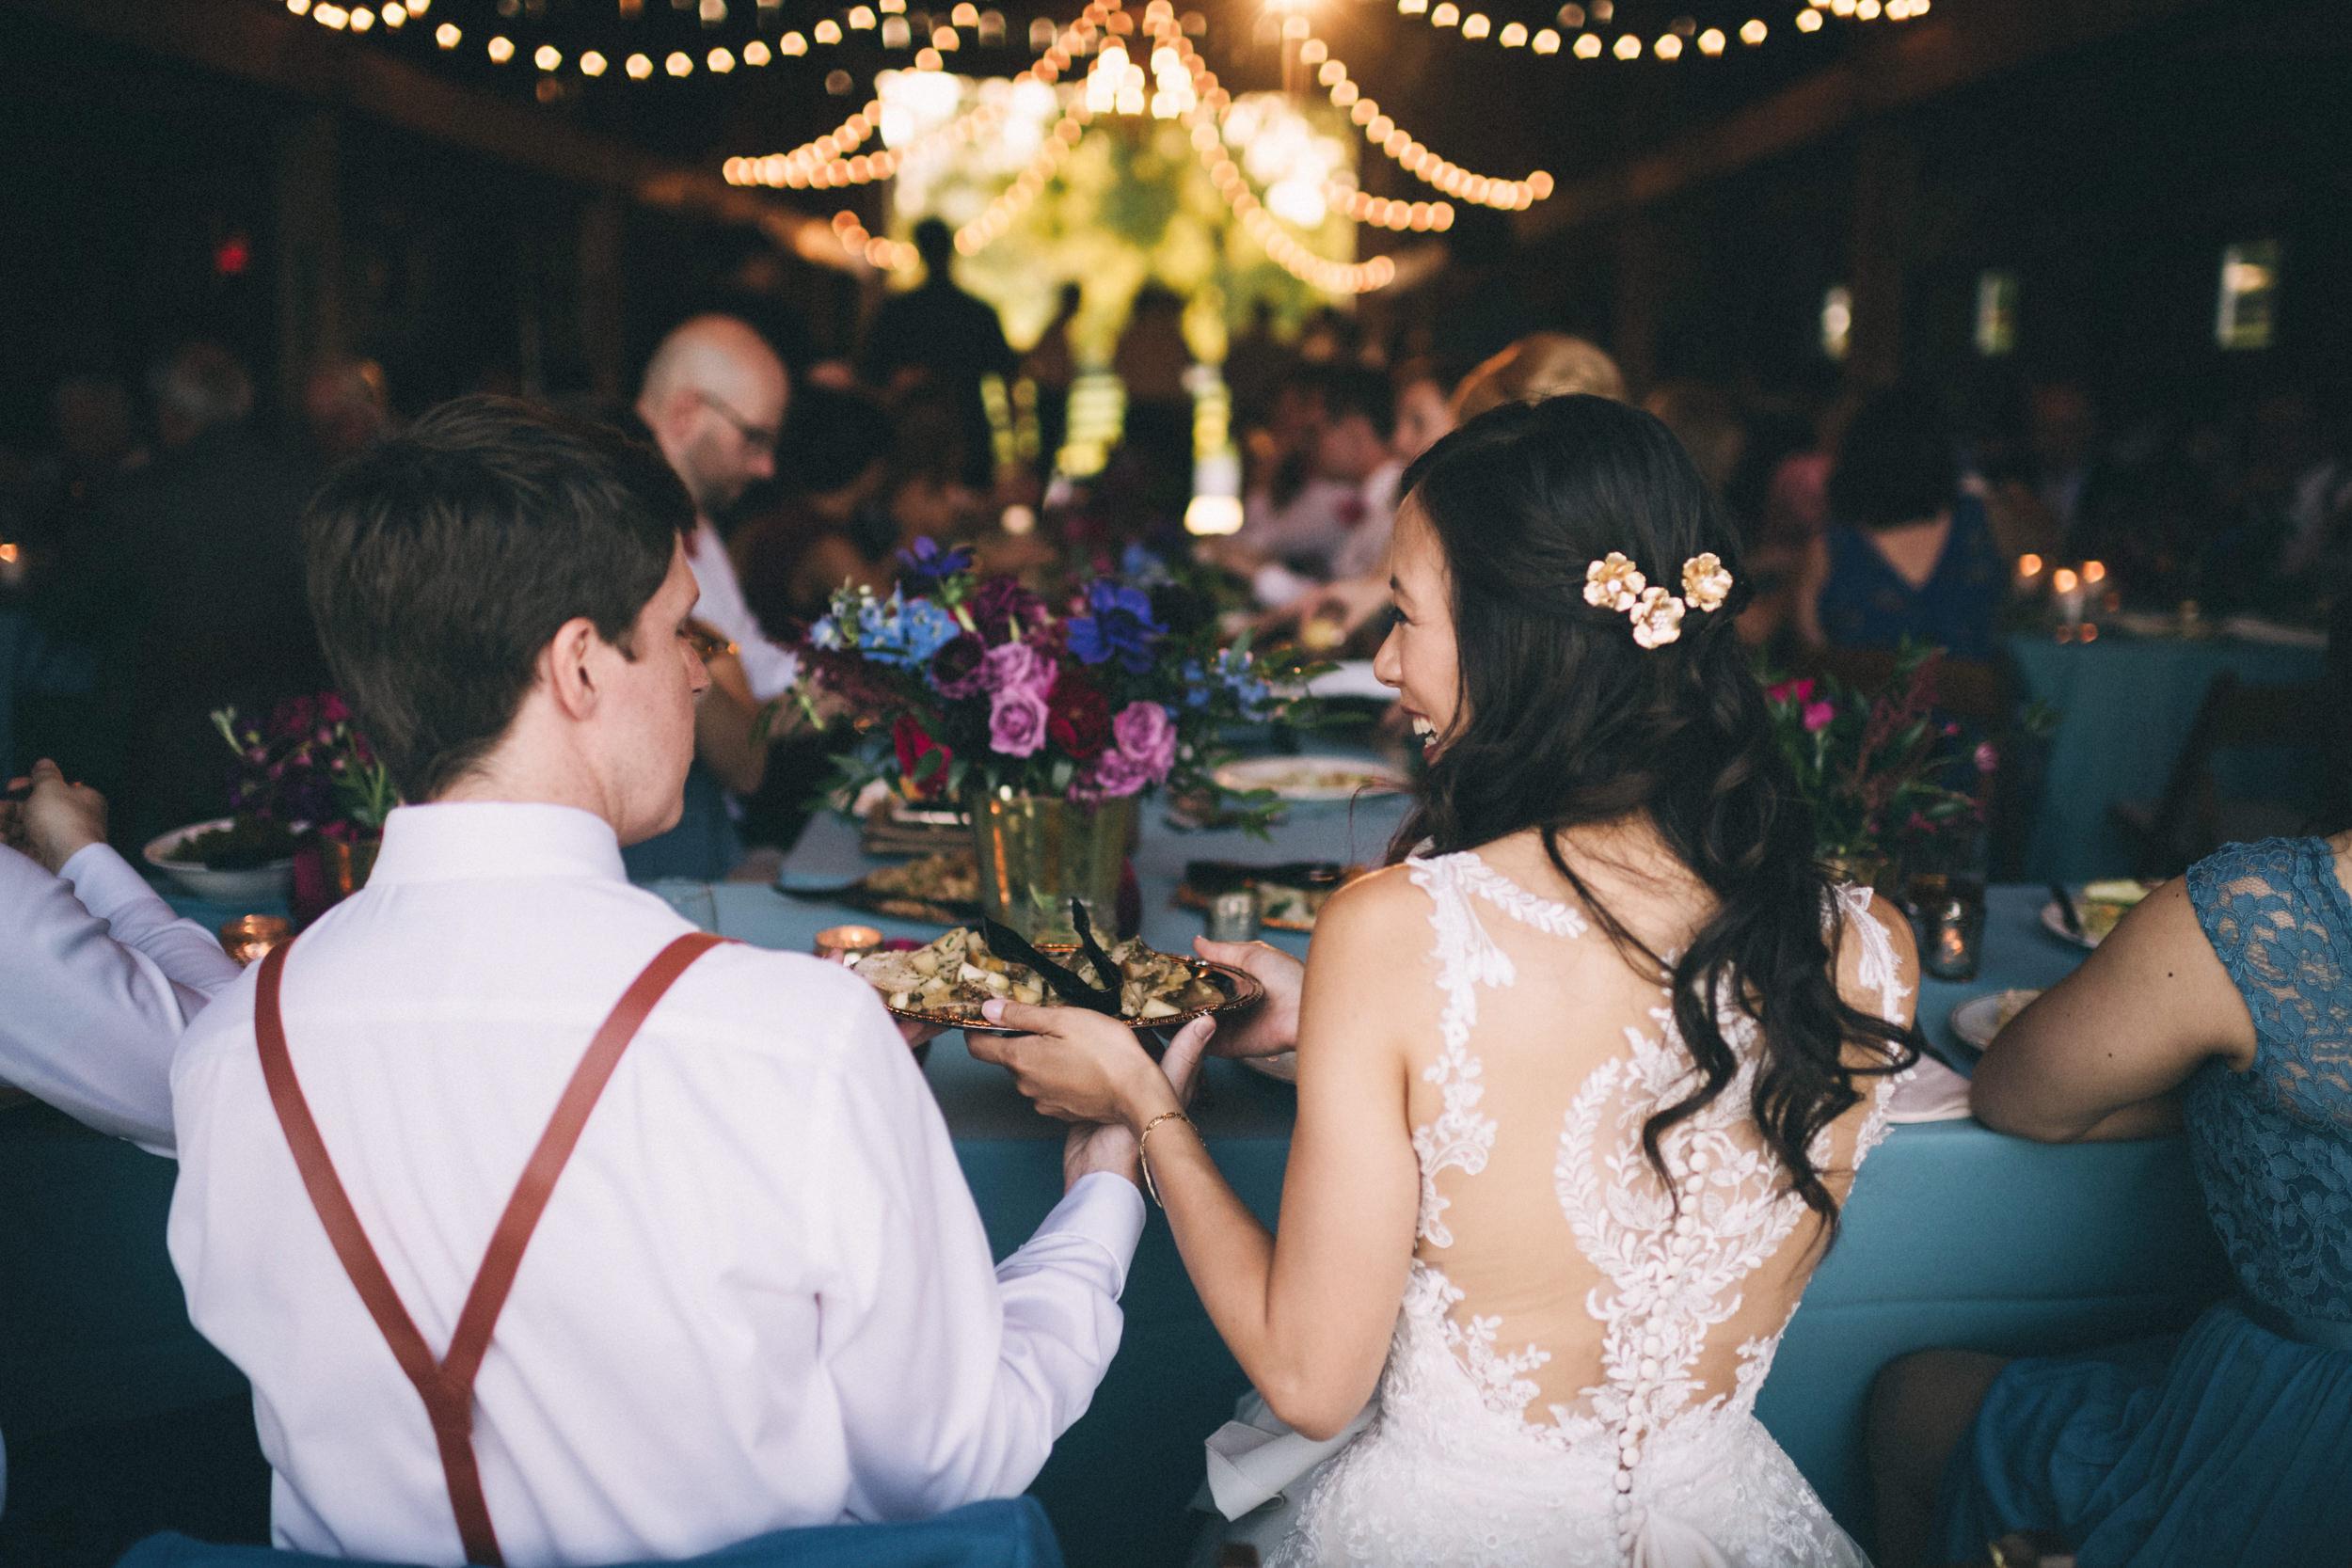 Louisville-Kentucky-Wedding-and-Elopement-Photographer-Sarah-Katherine-Davis-Photography-Summer-Jewel-Toned-Wedding-Chineese-Tea-Ceremony-Warrenwood-Manor-Danville-784.jpg